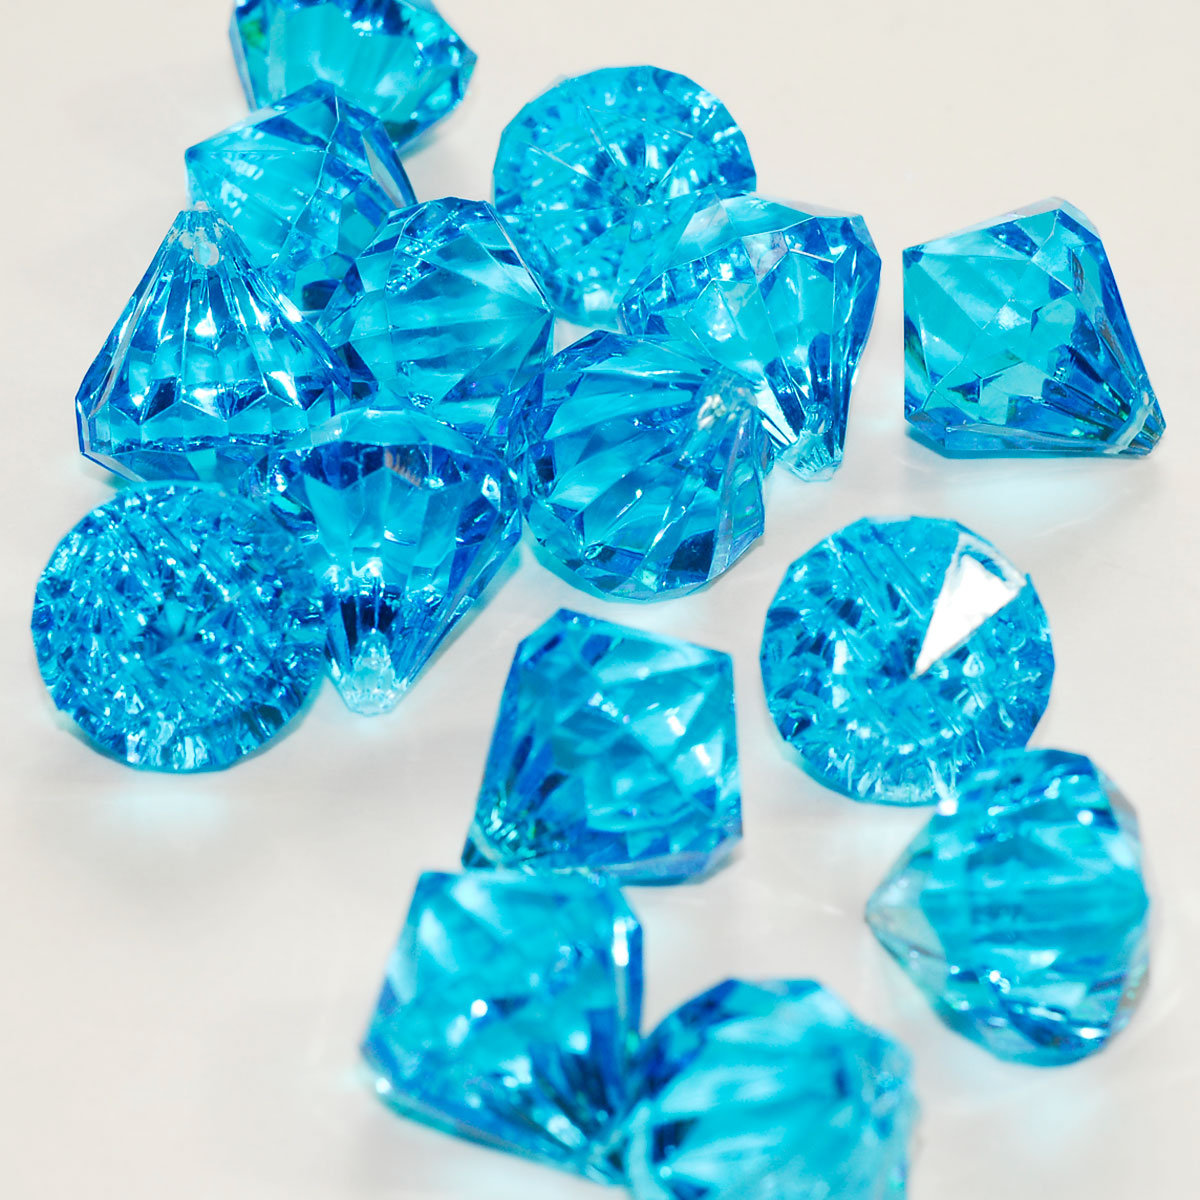 20k acrylic diamond wedding scatter vase filler pendant - Objet deco bleu turquoise ...